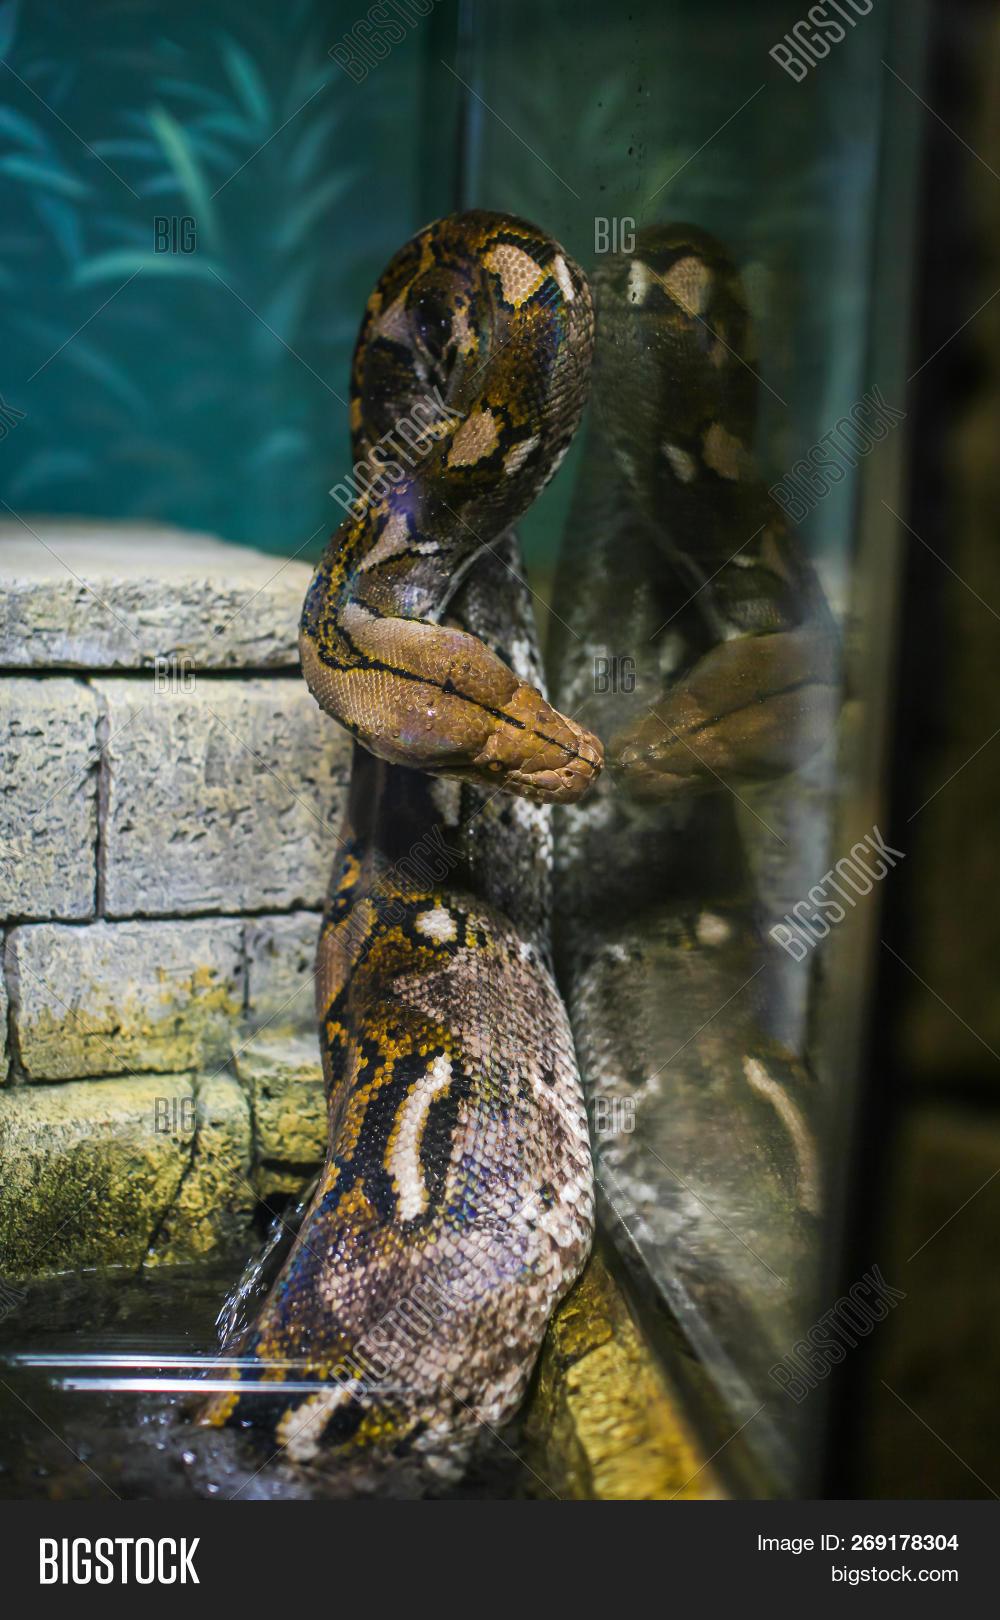 Dangerous Snake Boa Image Photo Free Trial Bigstock